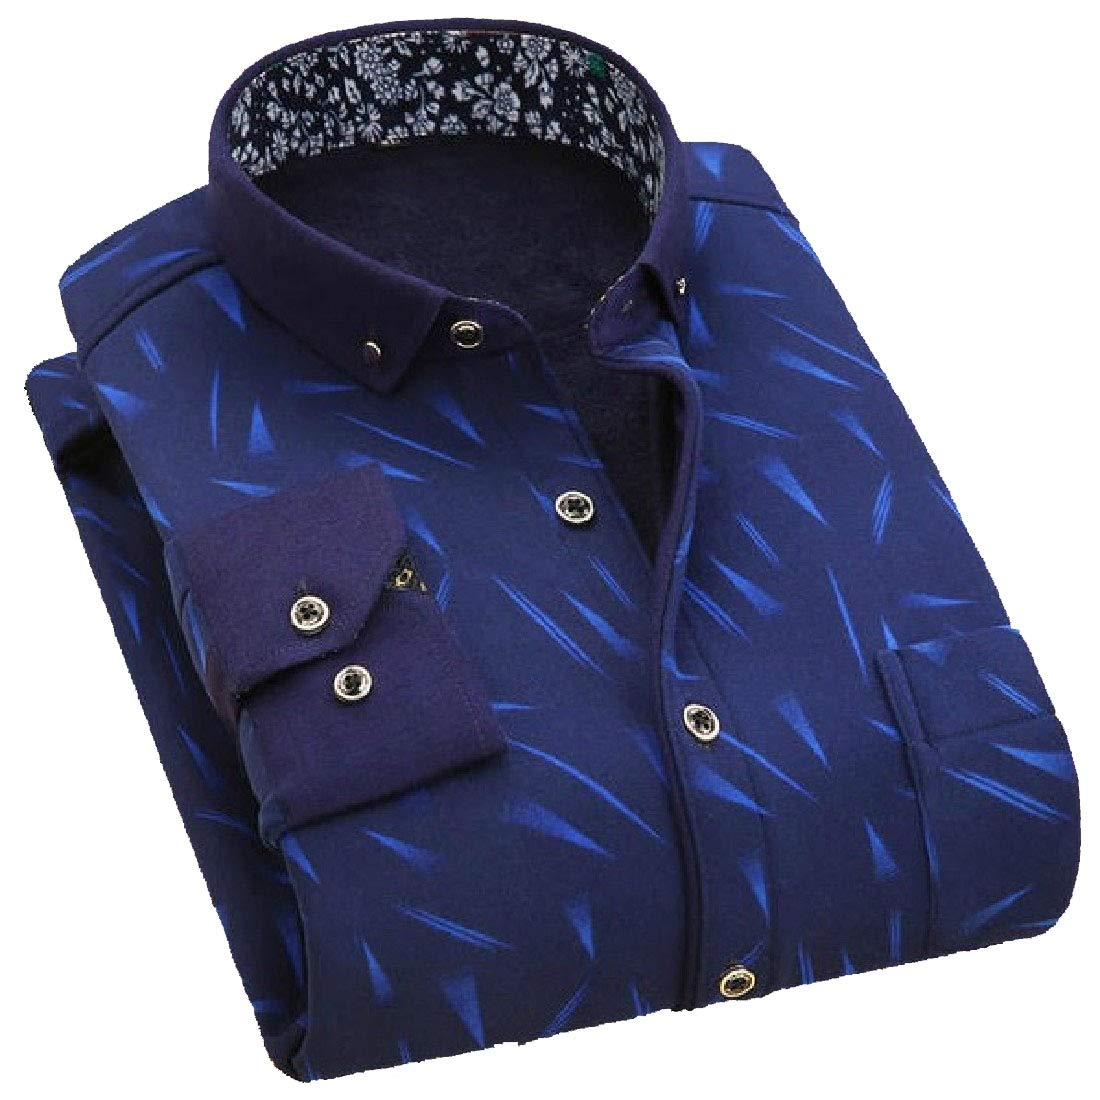 YUNY Men Leisure Warm Long Sleeve Button Turn-Down Collar Work Shirt AS17 XL